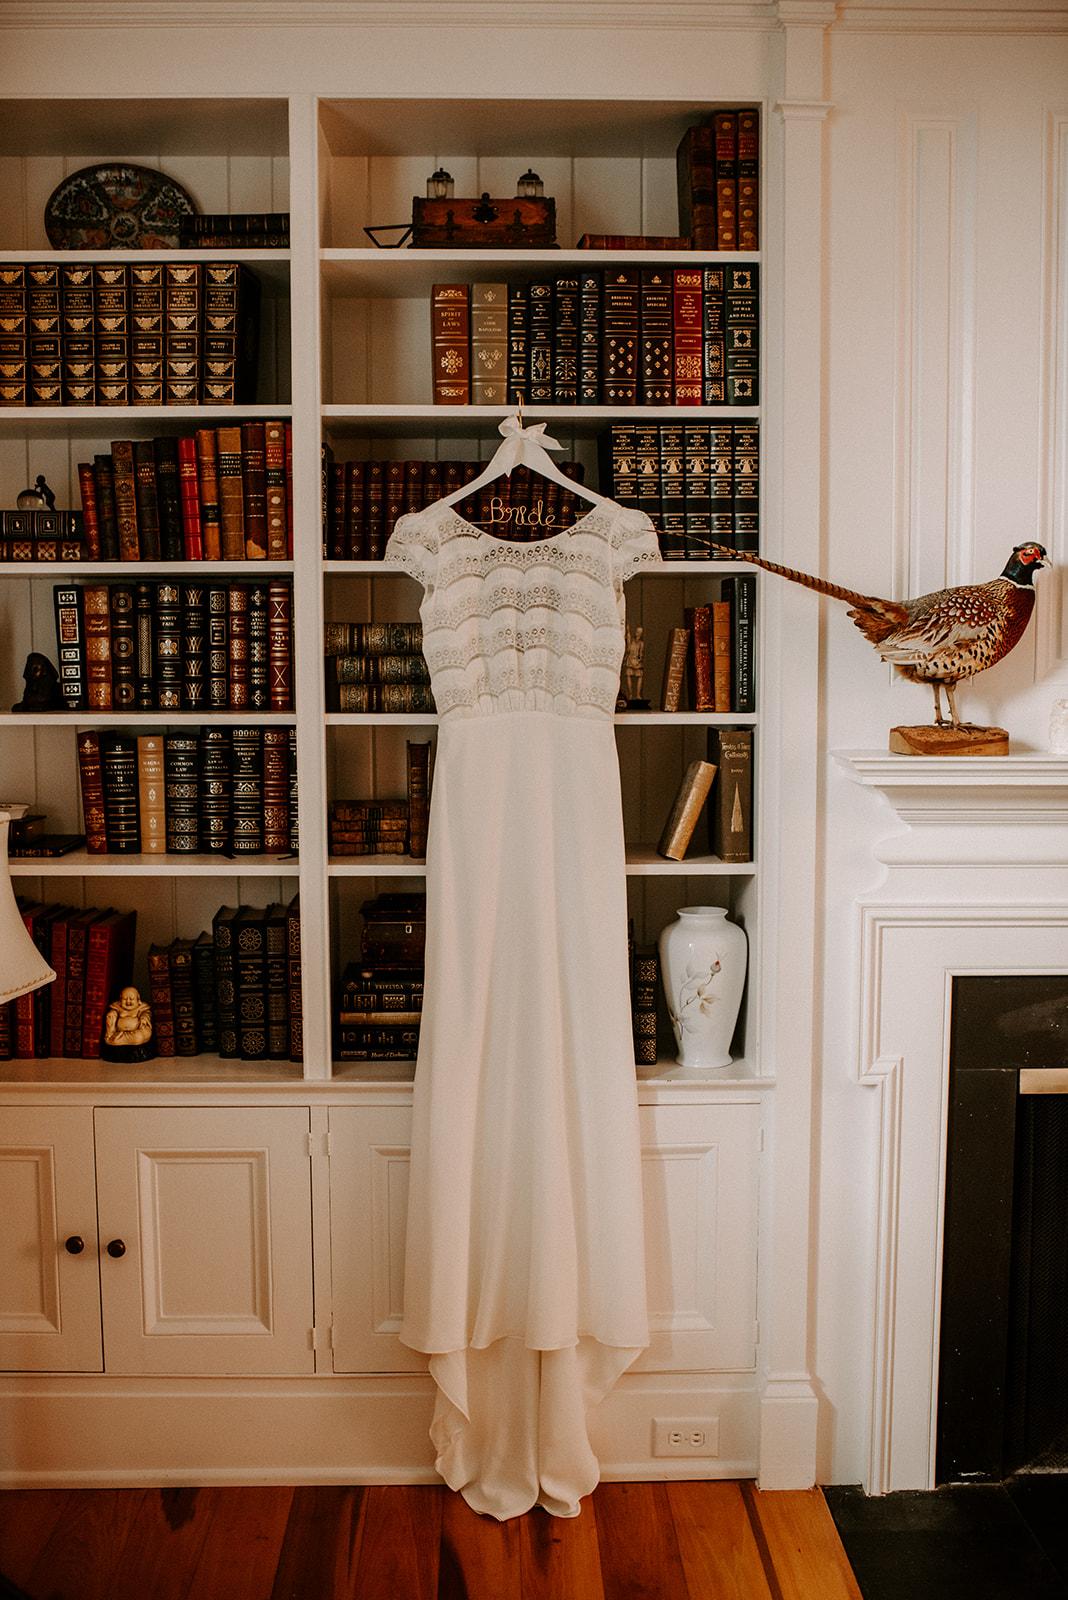 Boho wedding dress for Cedarmont Farm Wedding featured on Nashville Bride Guide!